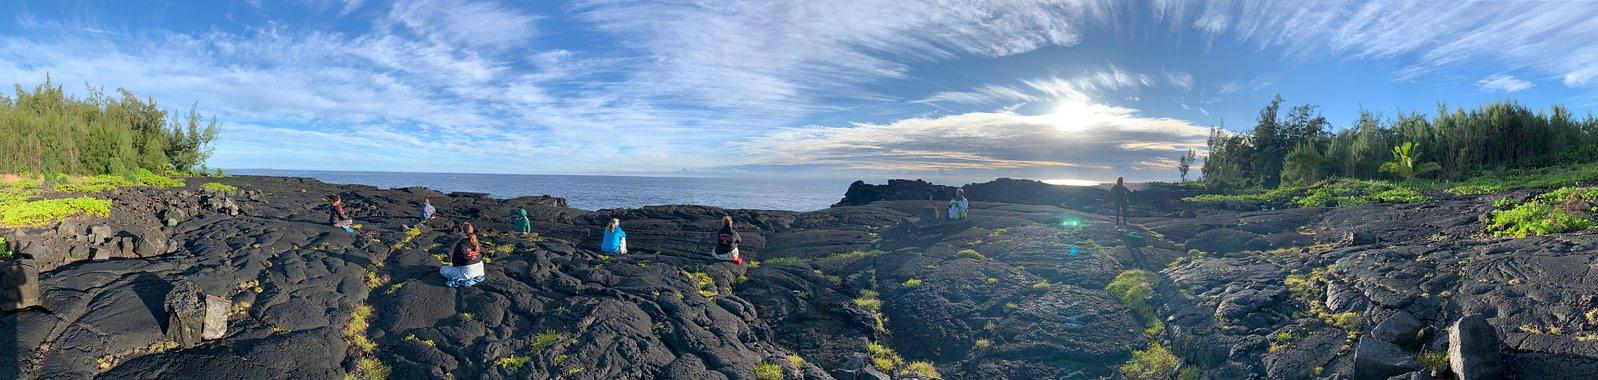 AlohaSpirit in Hawaii, Puna, Lomilomi Retreat mit Kumu Dane Kaohelani Silva